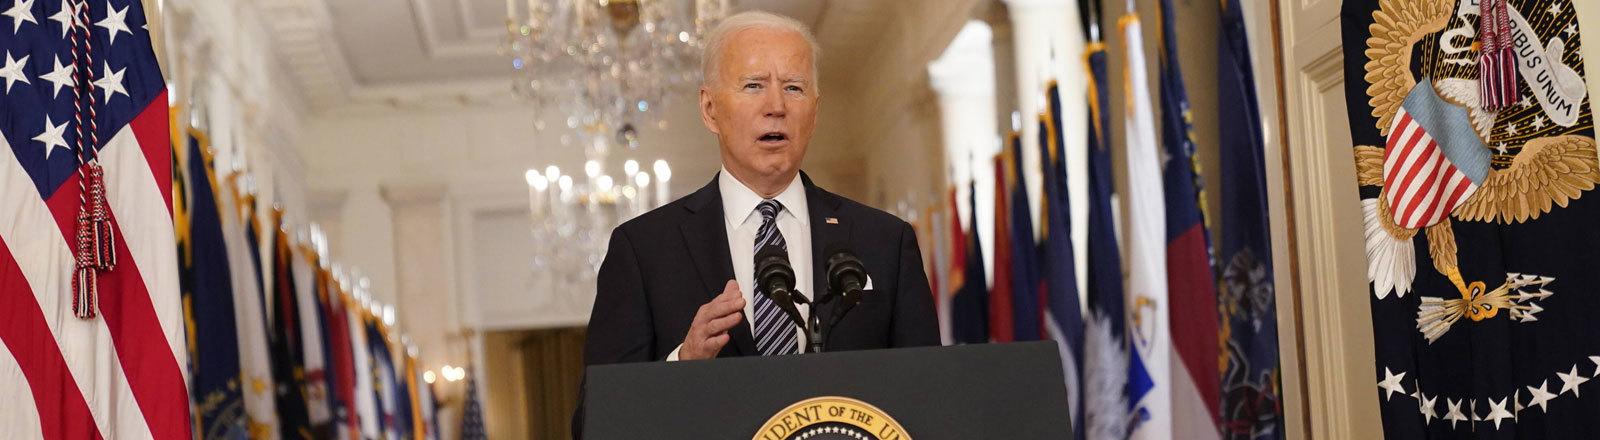 Joe Biden, der 46. Präsident der USA.